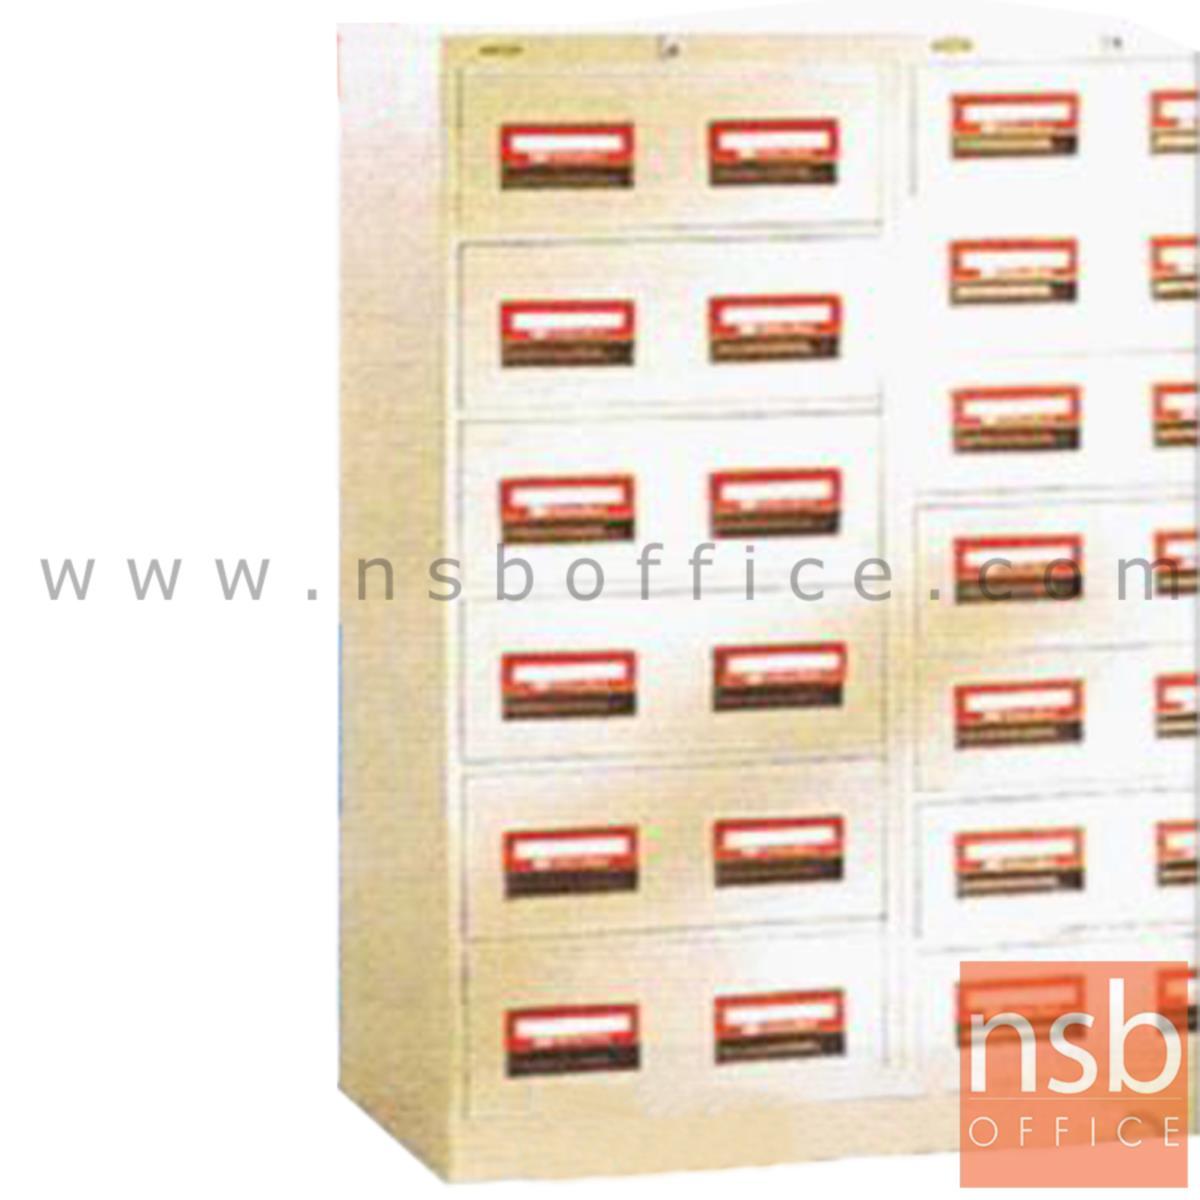 "E16A003:ตู้เก็บบัตร 6 ลิ้นชัก (บัตรขนาด 6""*8"" นิ้ว) 541W*616D*1322H mm"